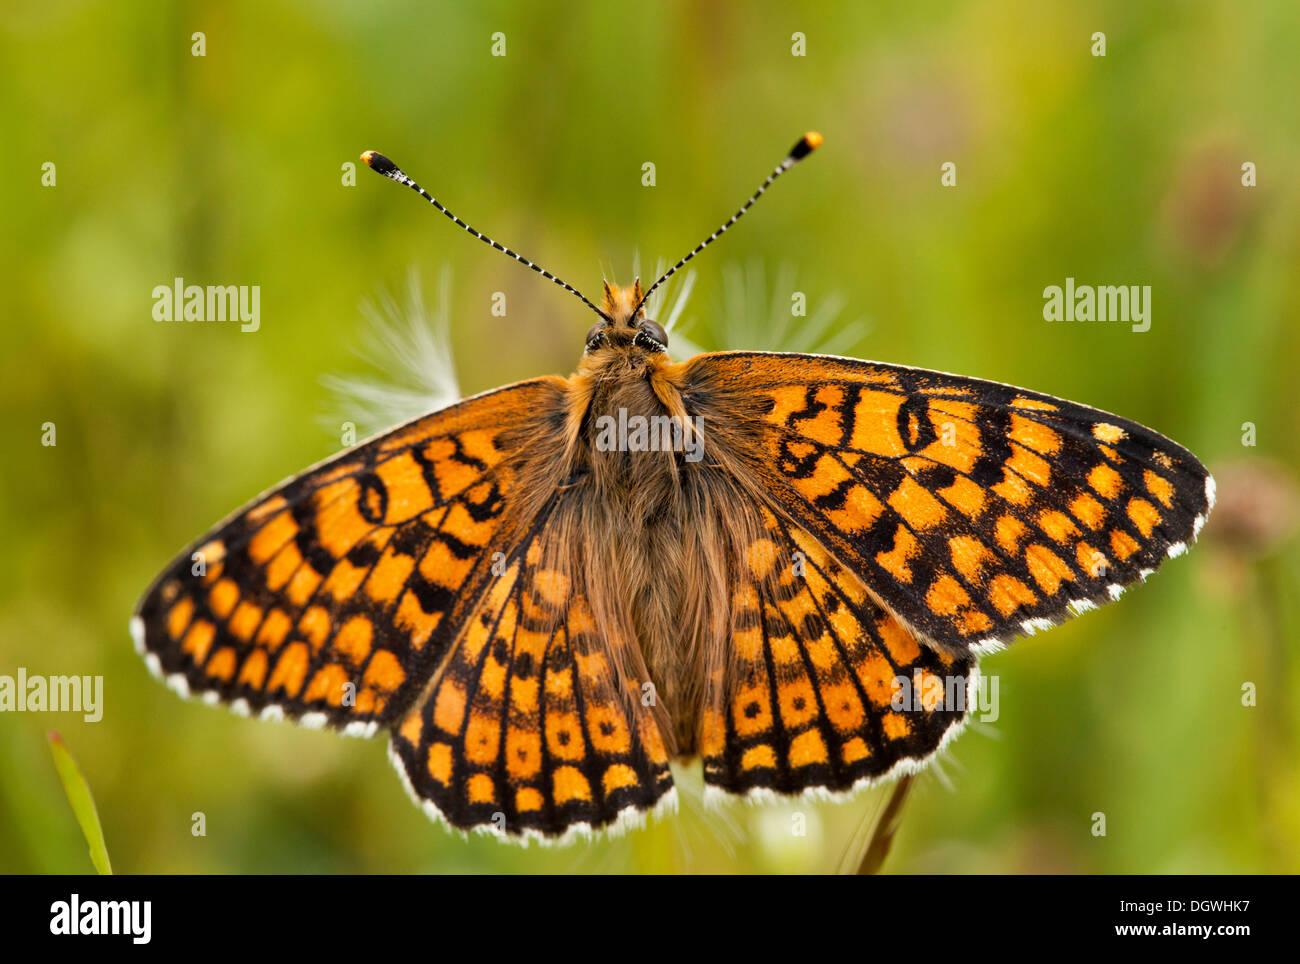 Glanville Fritillary, Melitaea cinxia, basking in the sun. Very rare in the UK. - Stock Image